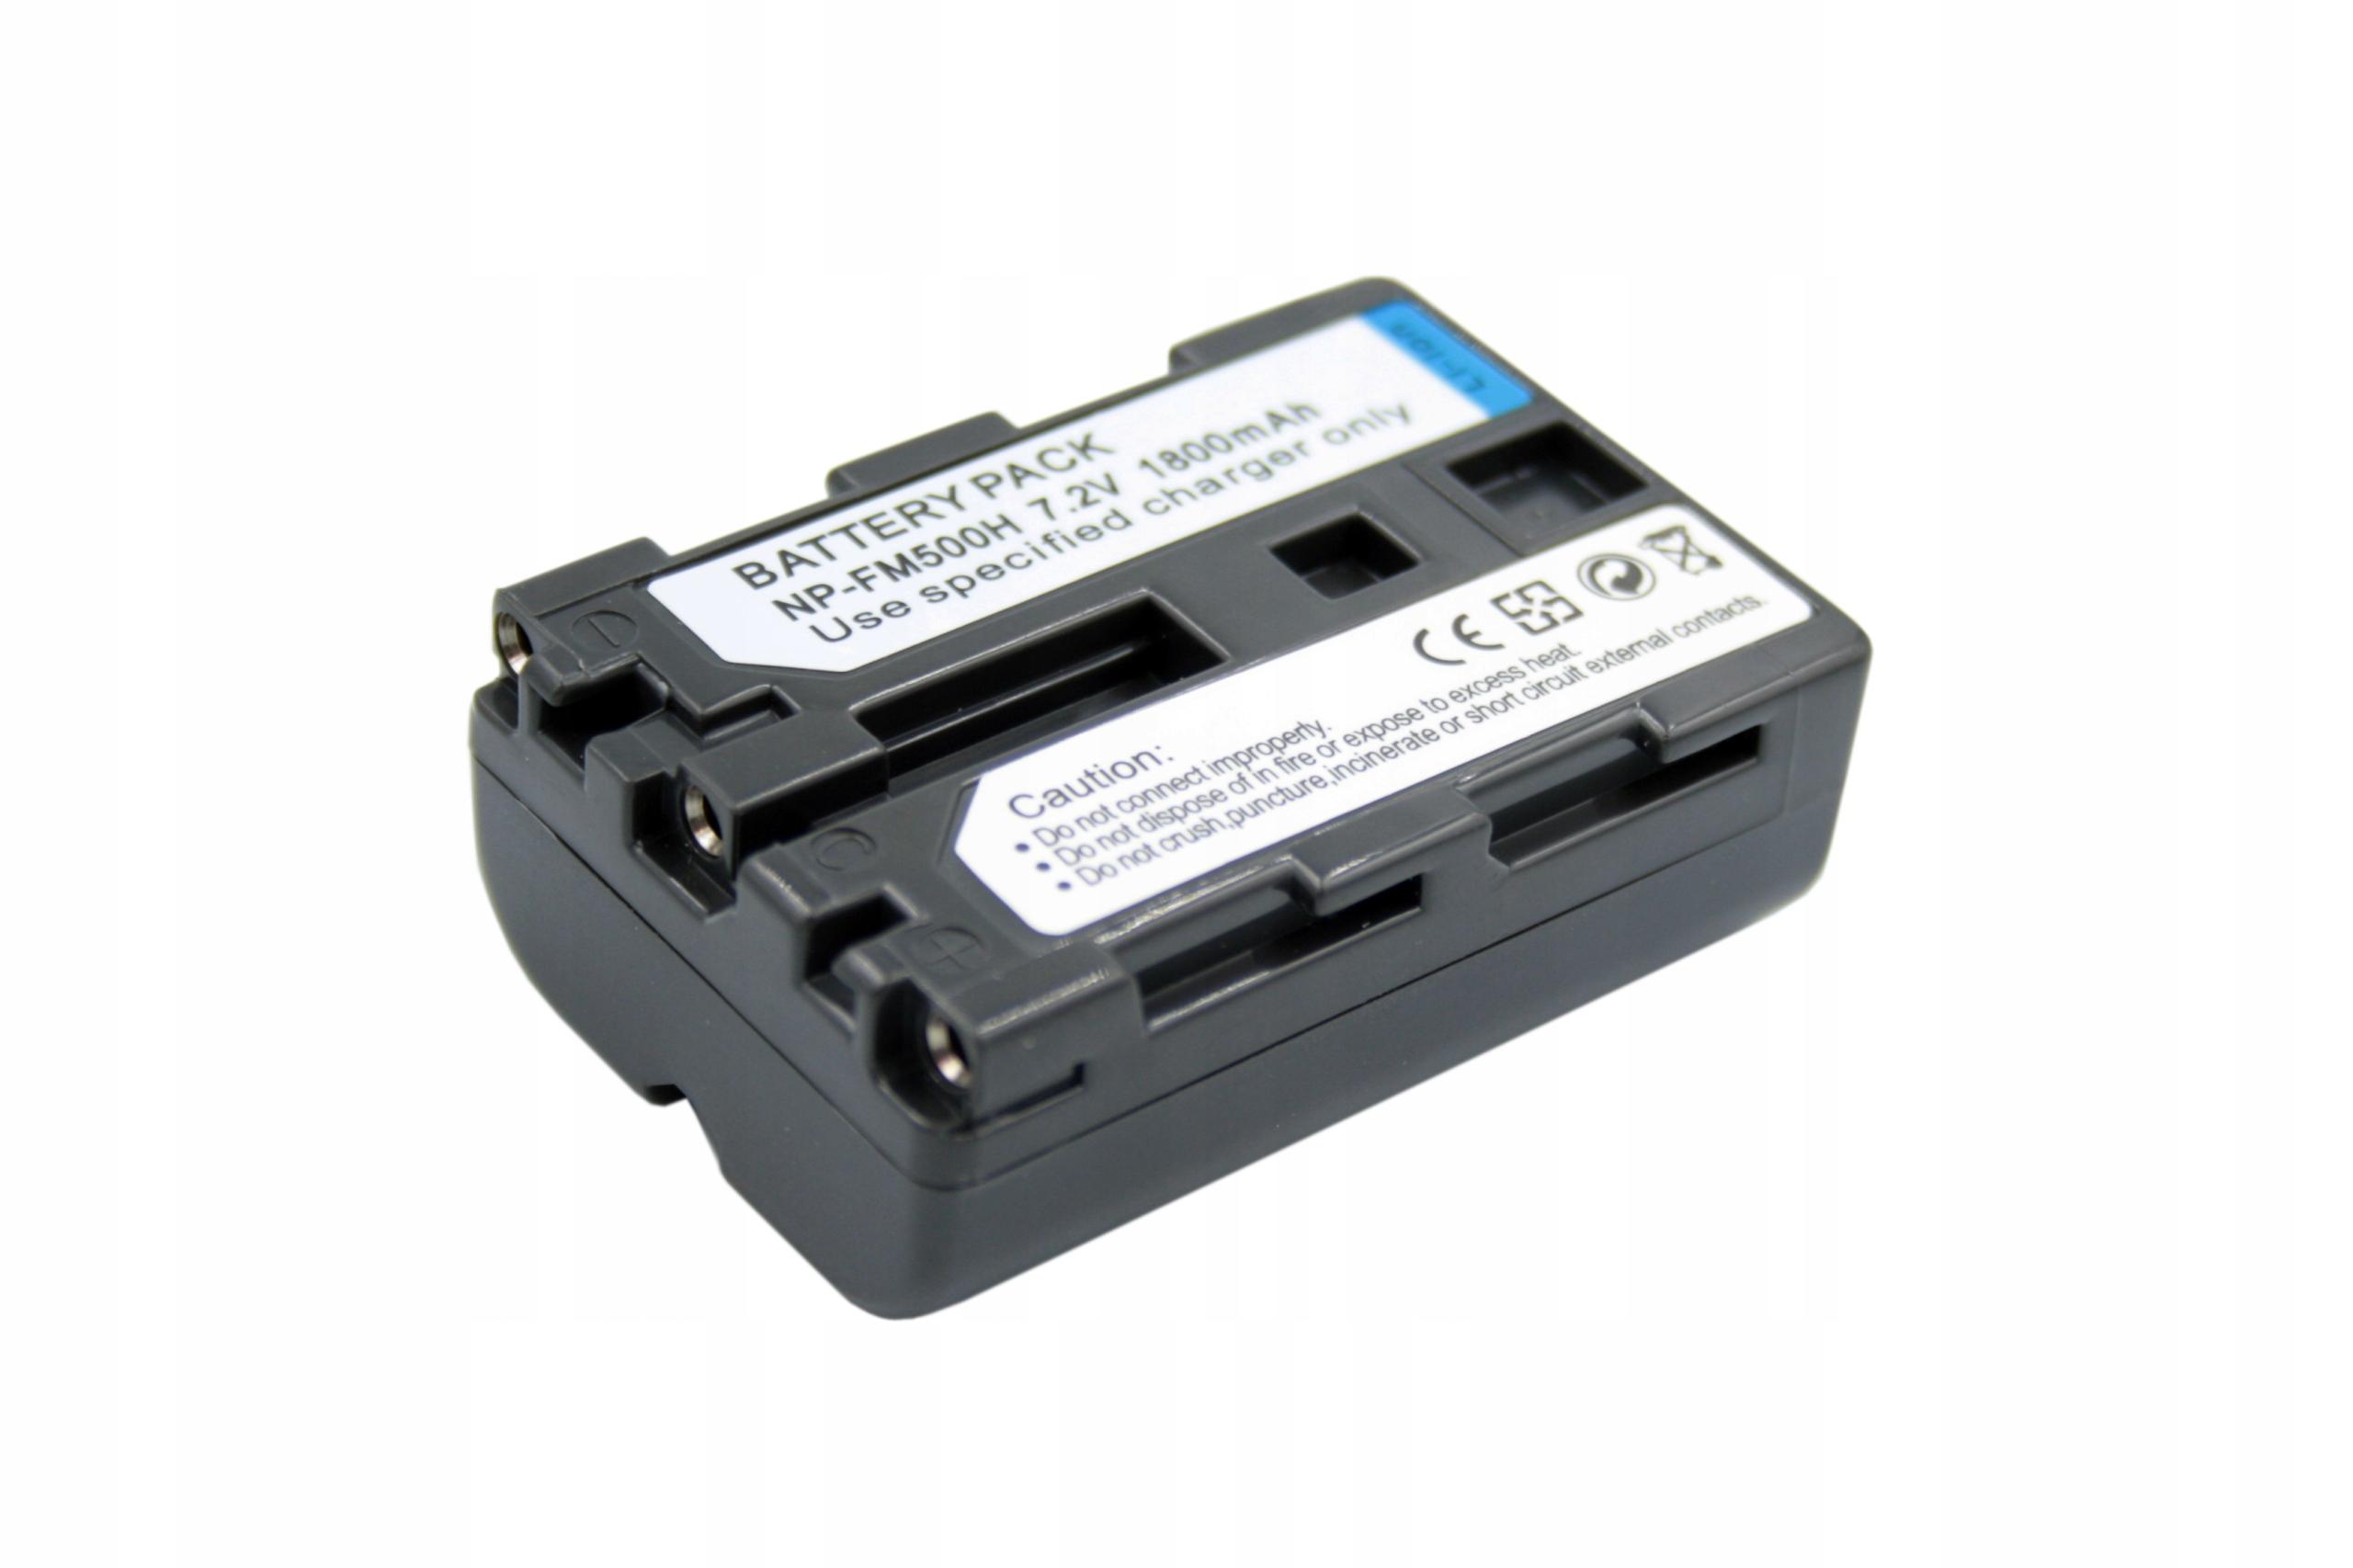 BATERIA AKUMULATOR SONY ALPHA DSLR-A100 DSLR-A300 A500 A700 - Baterie do aparatów cyfrowych